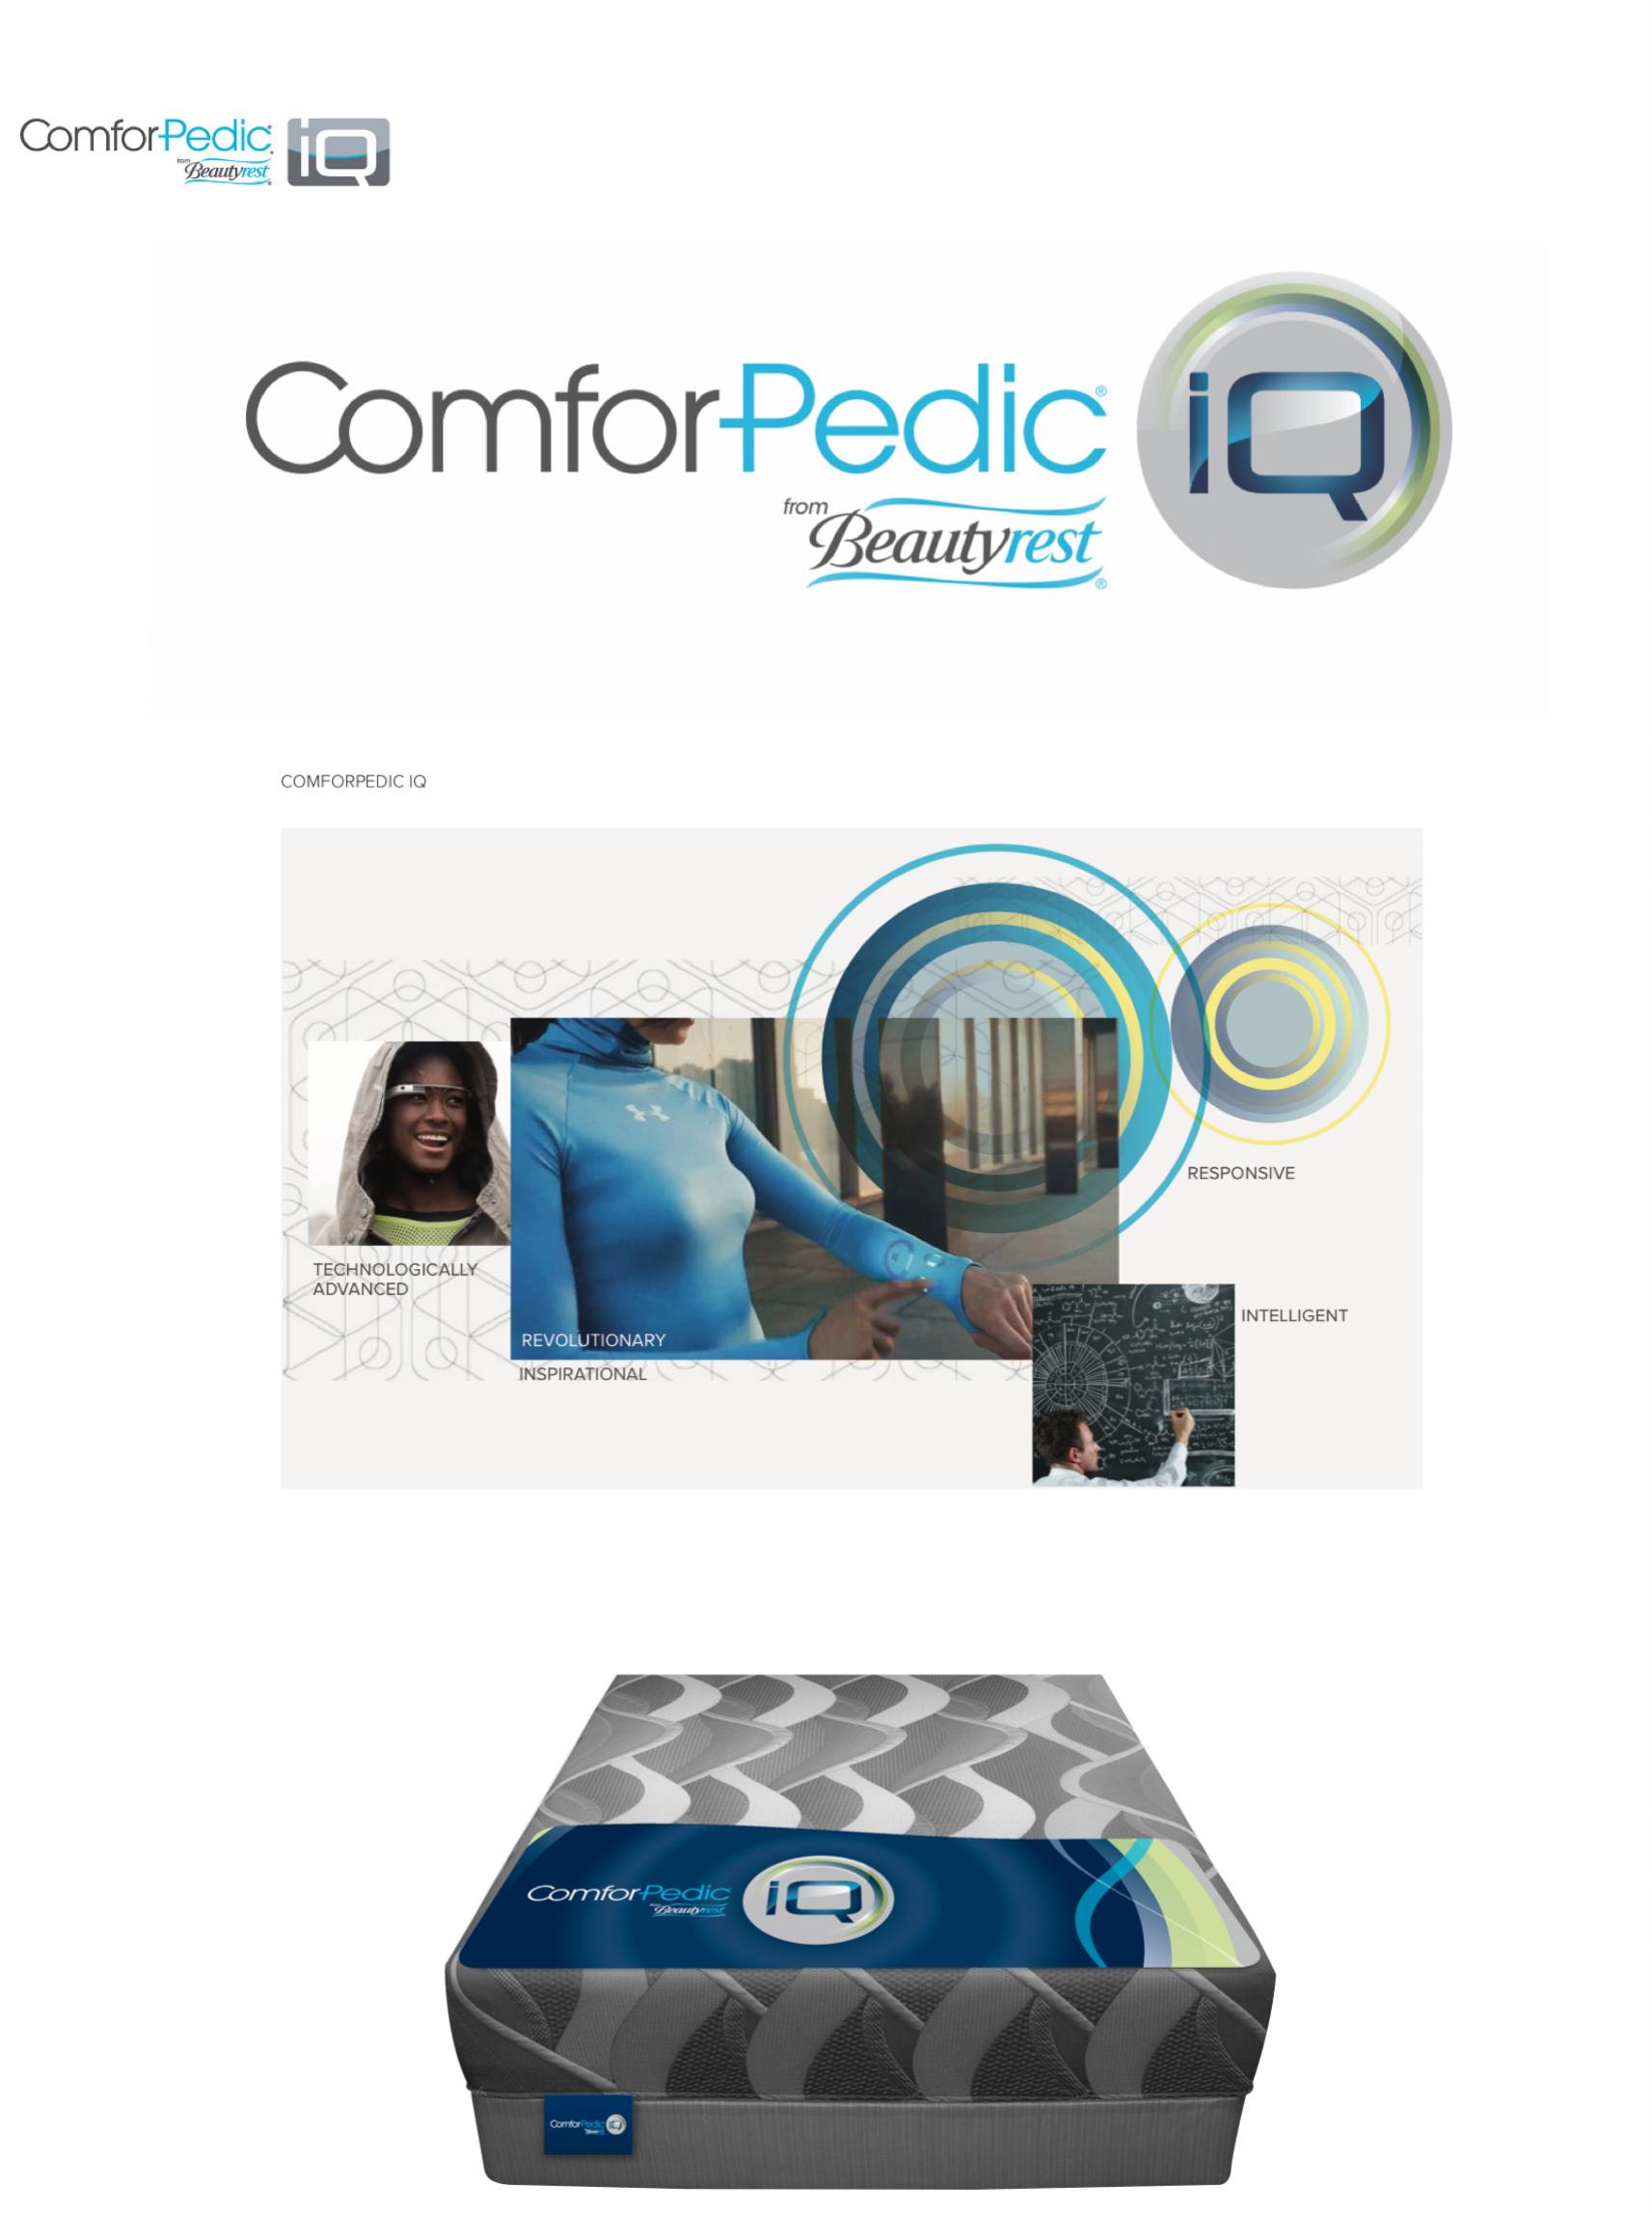 Created Logo to look like an app, moodboard & foot streamer